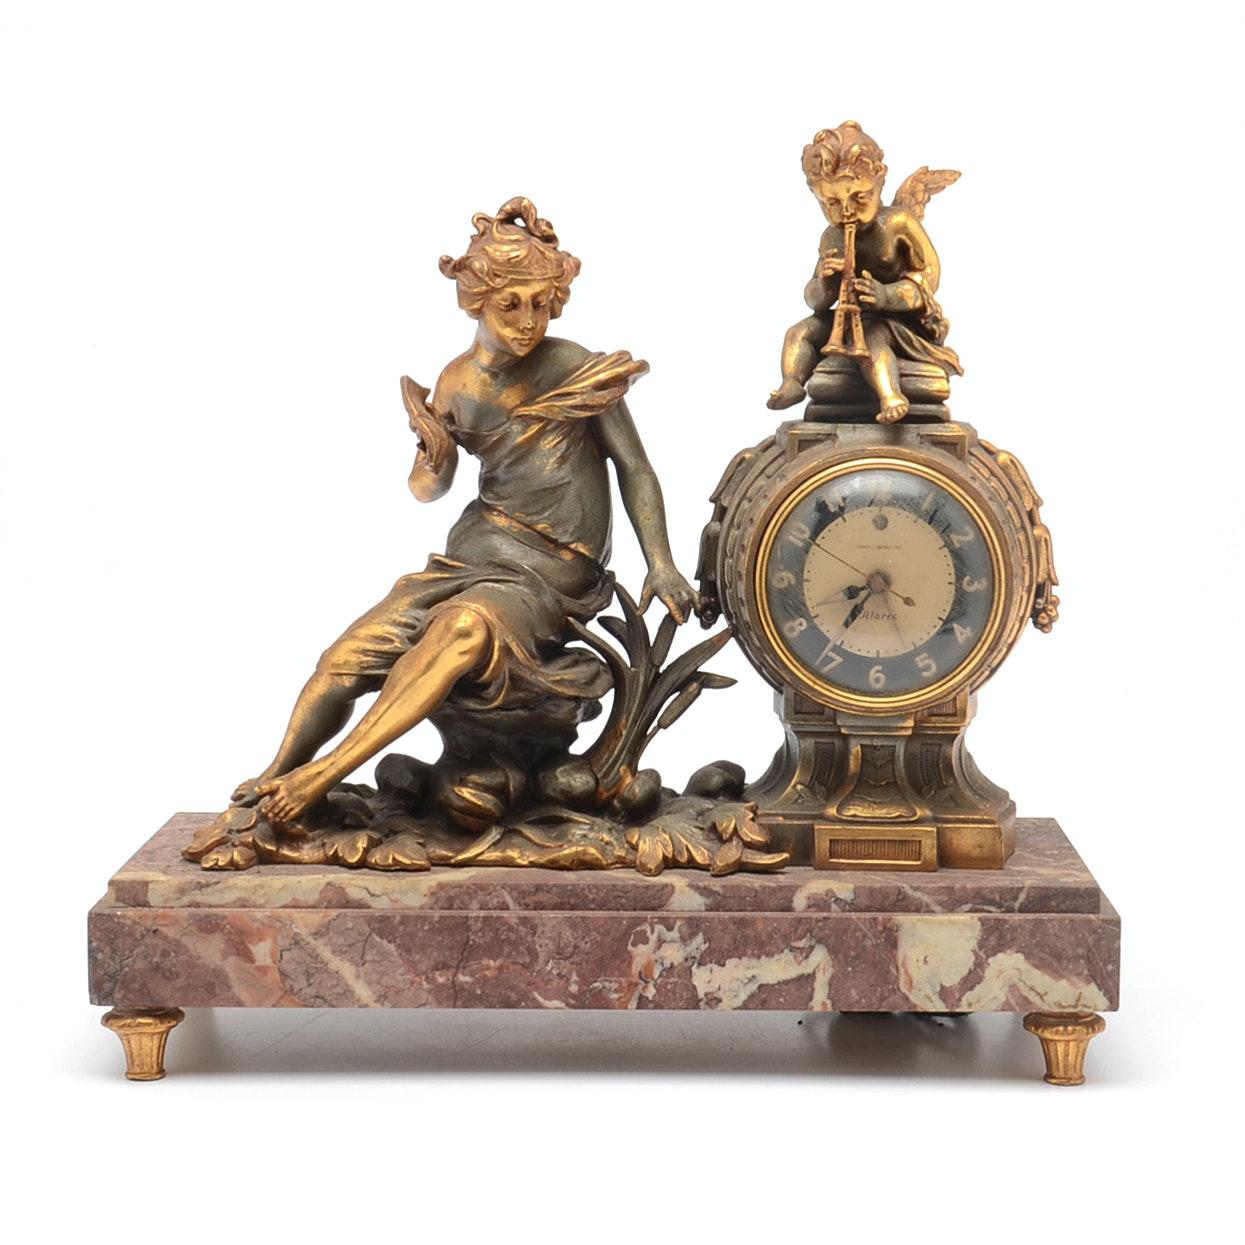 Vintage General Electric Marble Figural Mantel Clock